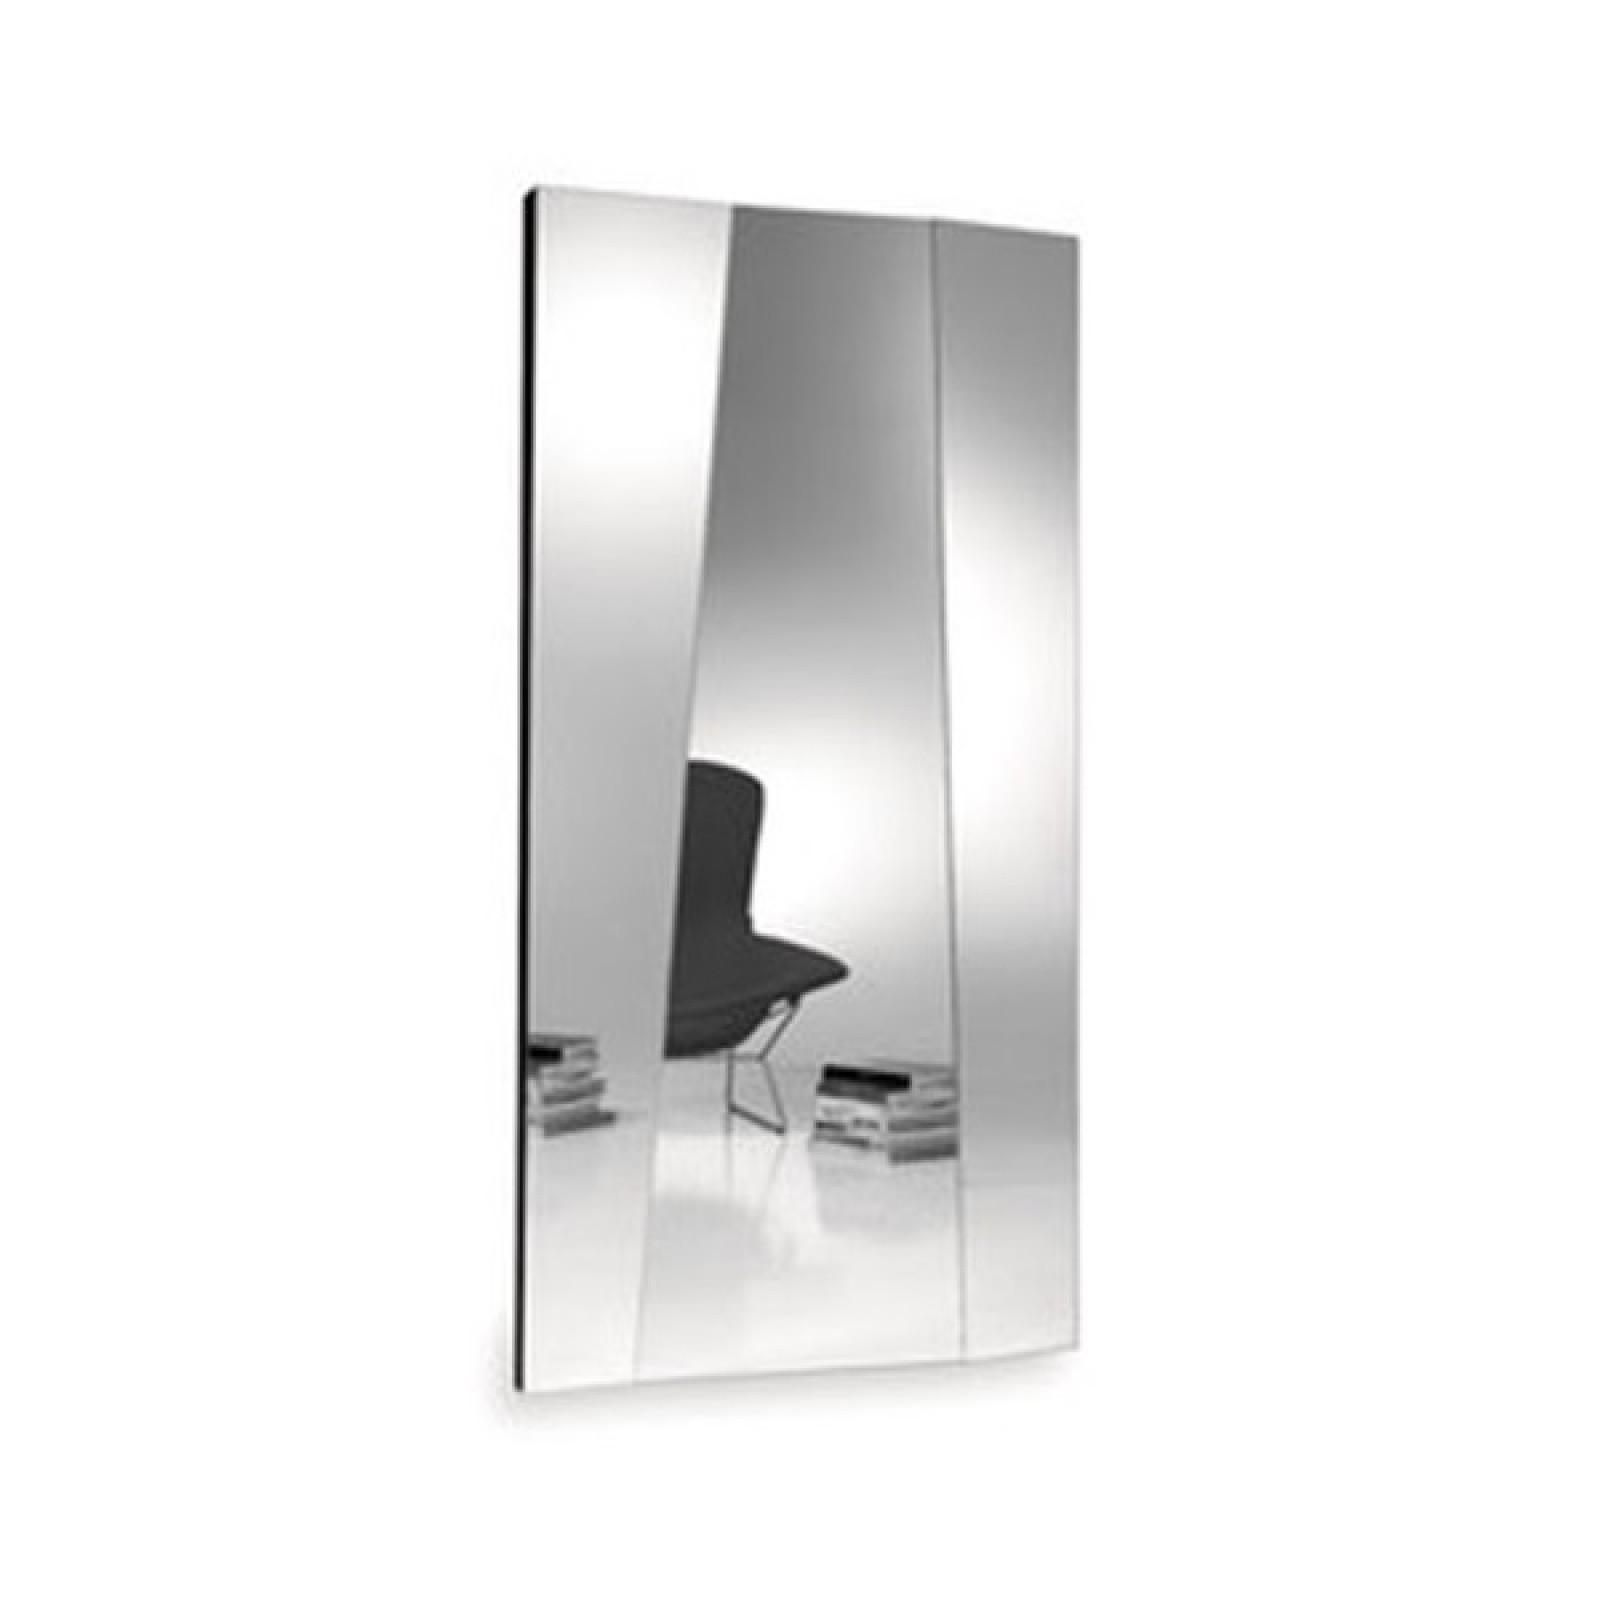 Autostima Floor Standing Mirror - Tonelli Design